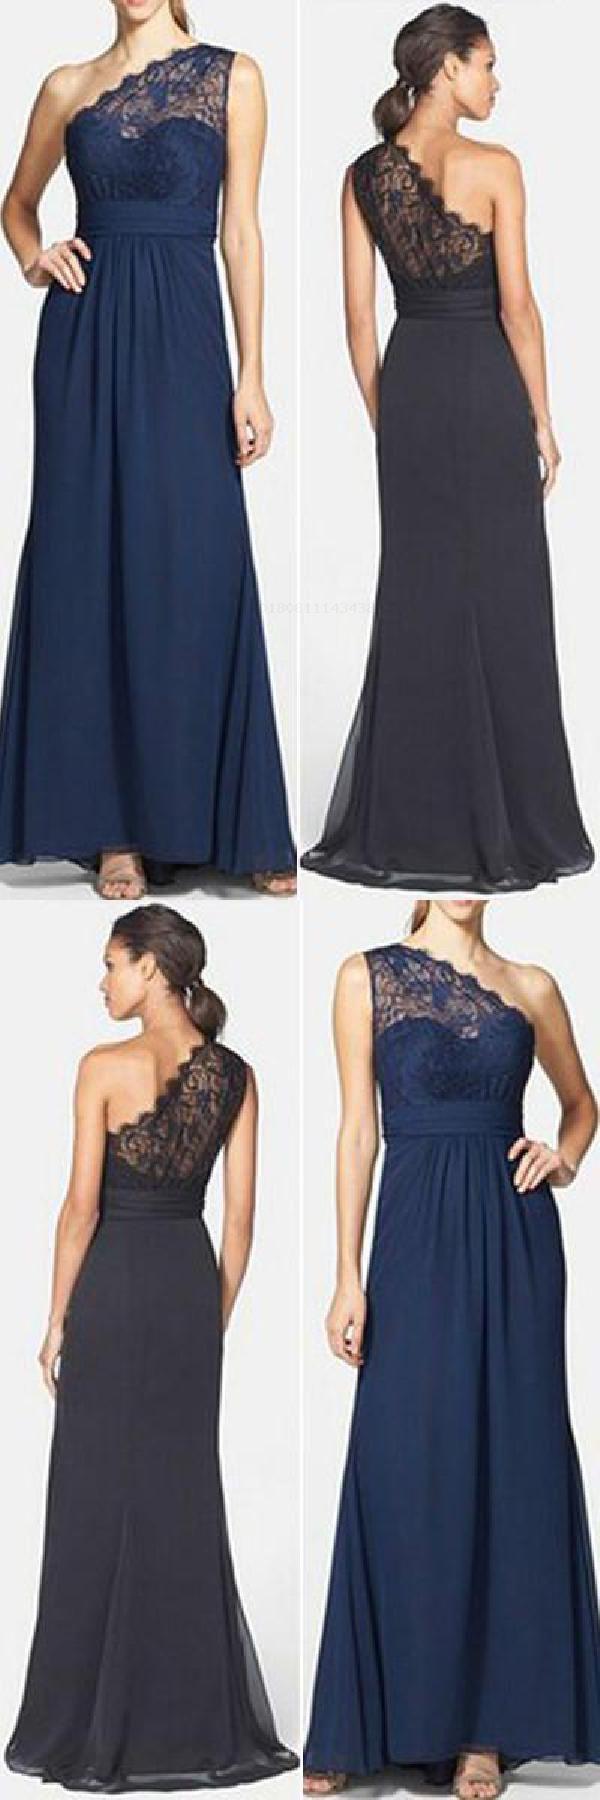 Aline navy blue lace long simi bridesmaid dresses